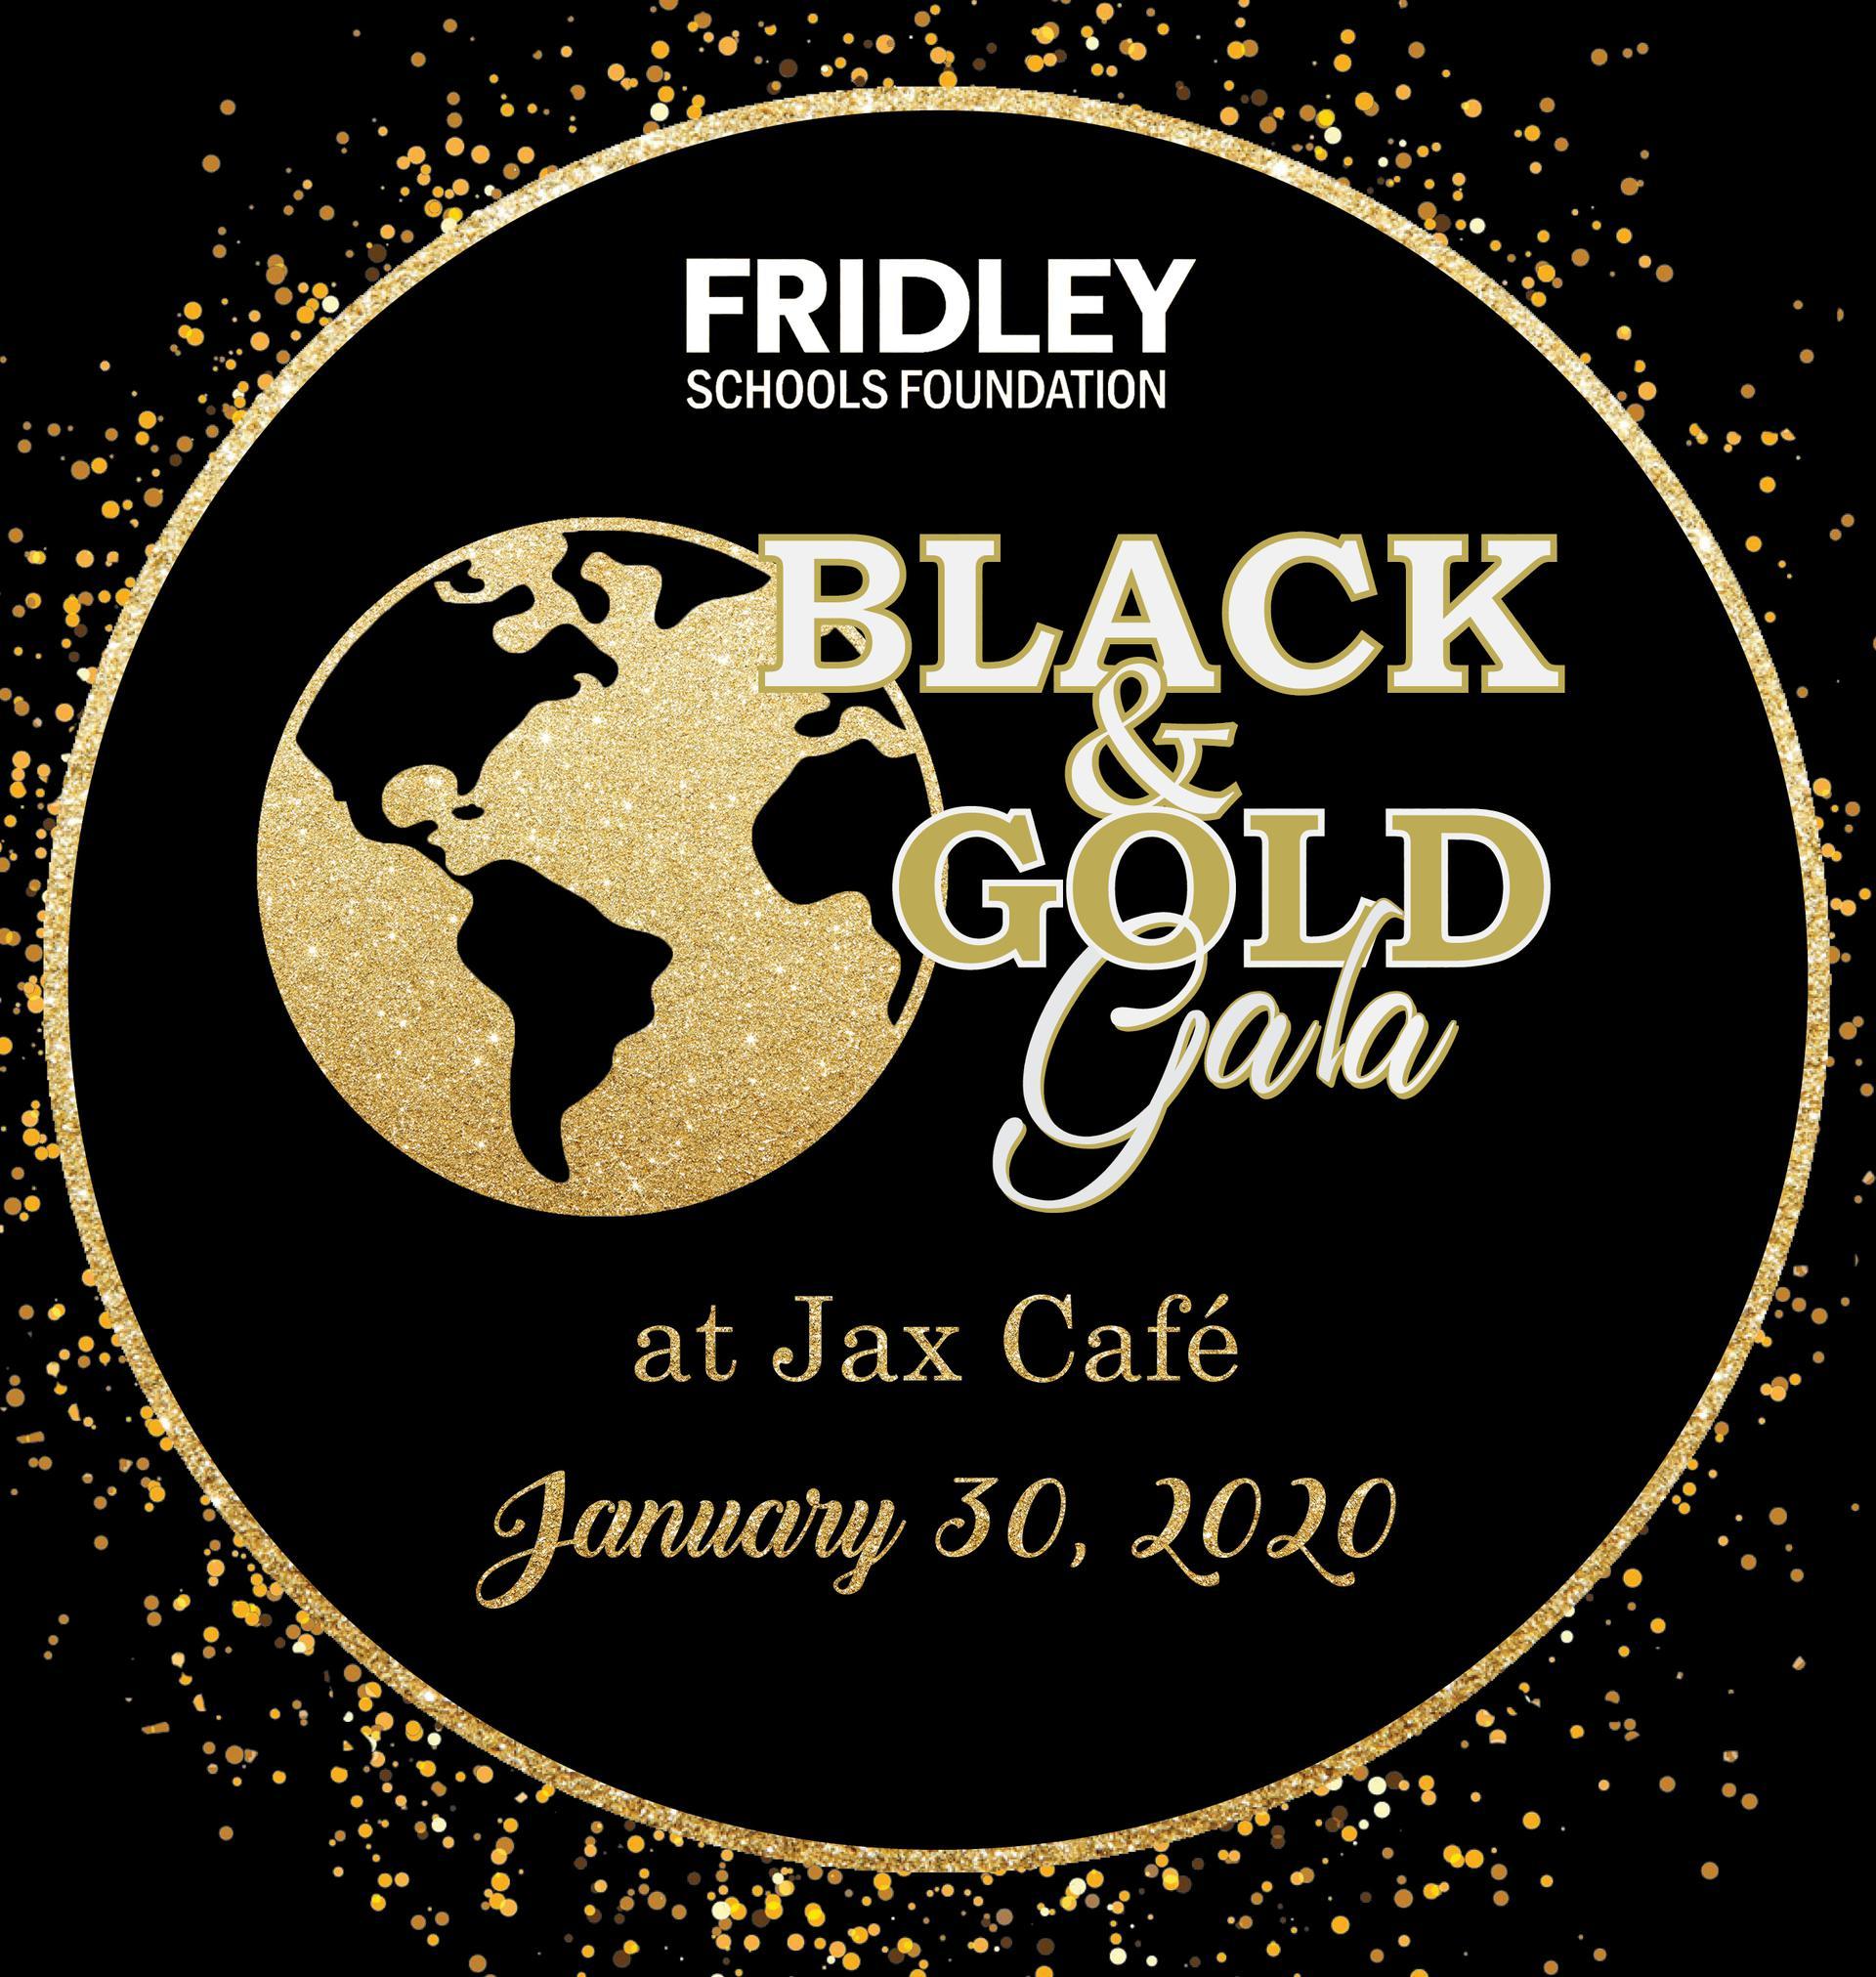 Black & Gold Gala